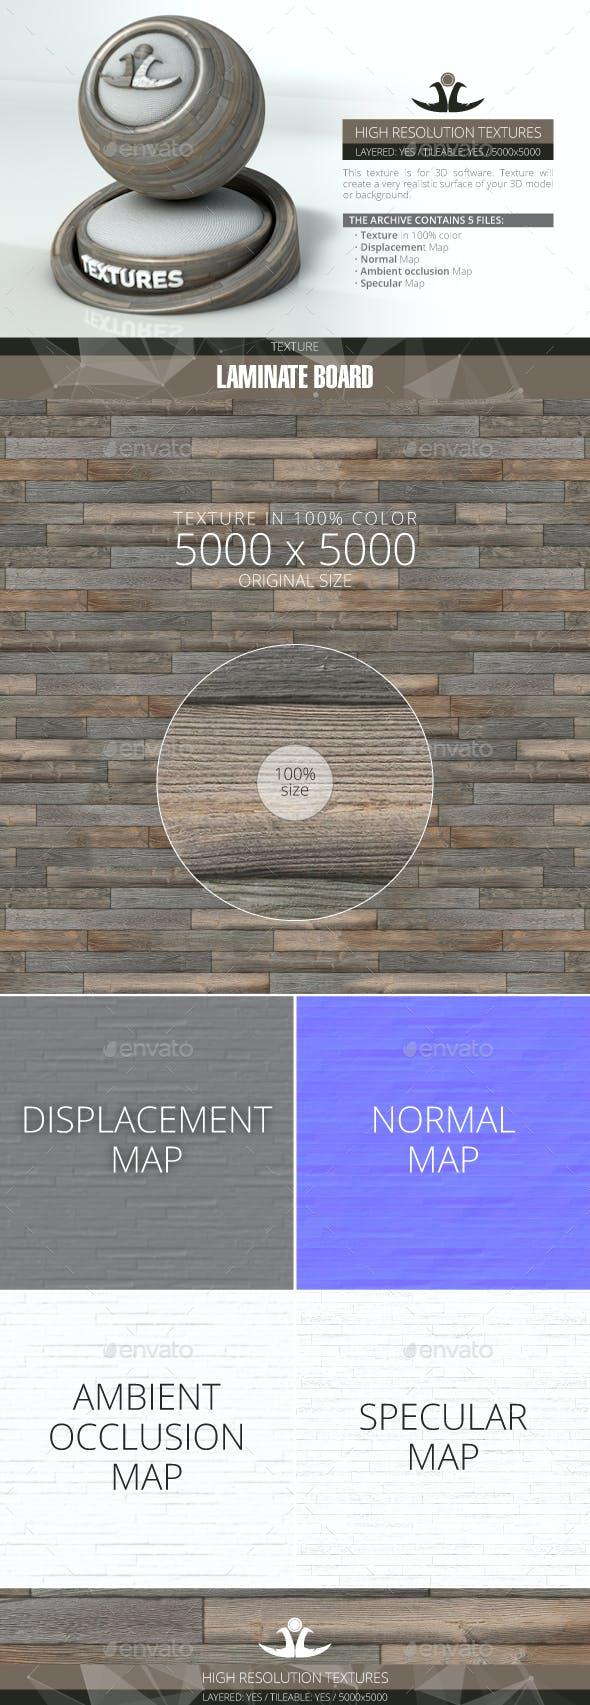 Laminate Board 75 - 3DOcean Item for Sale